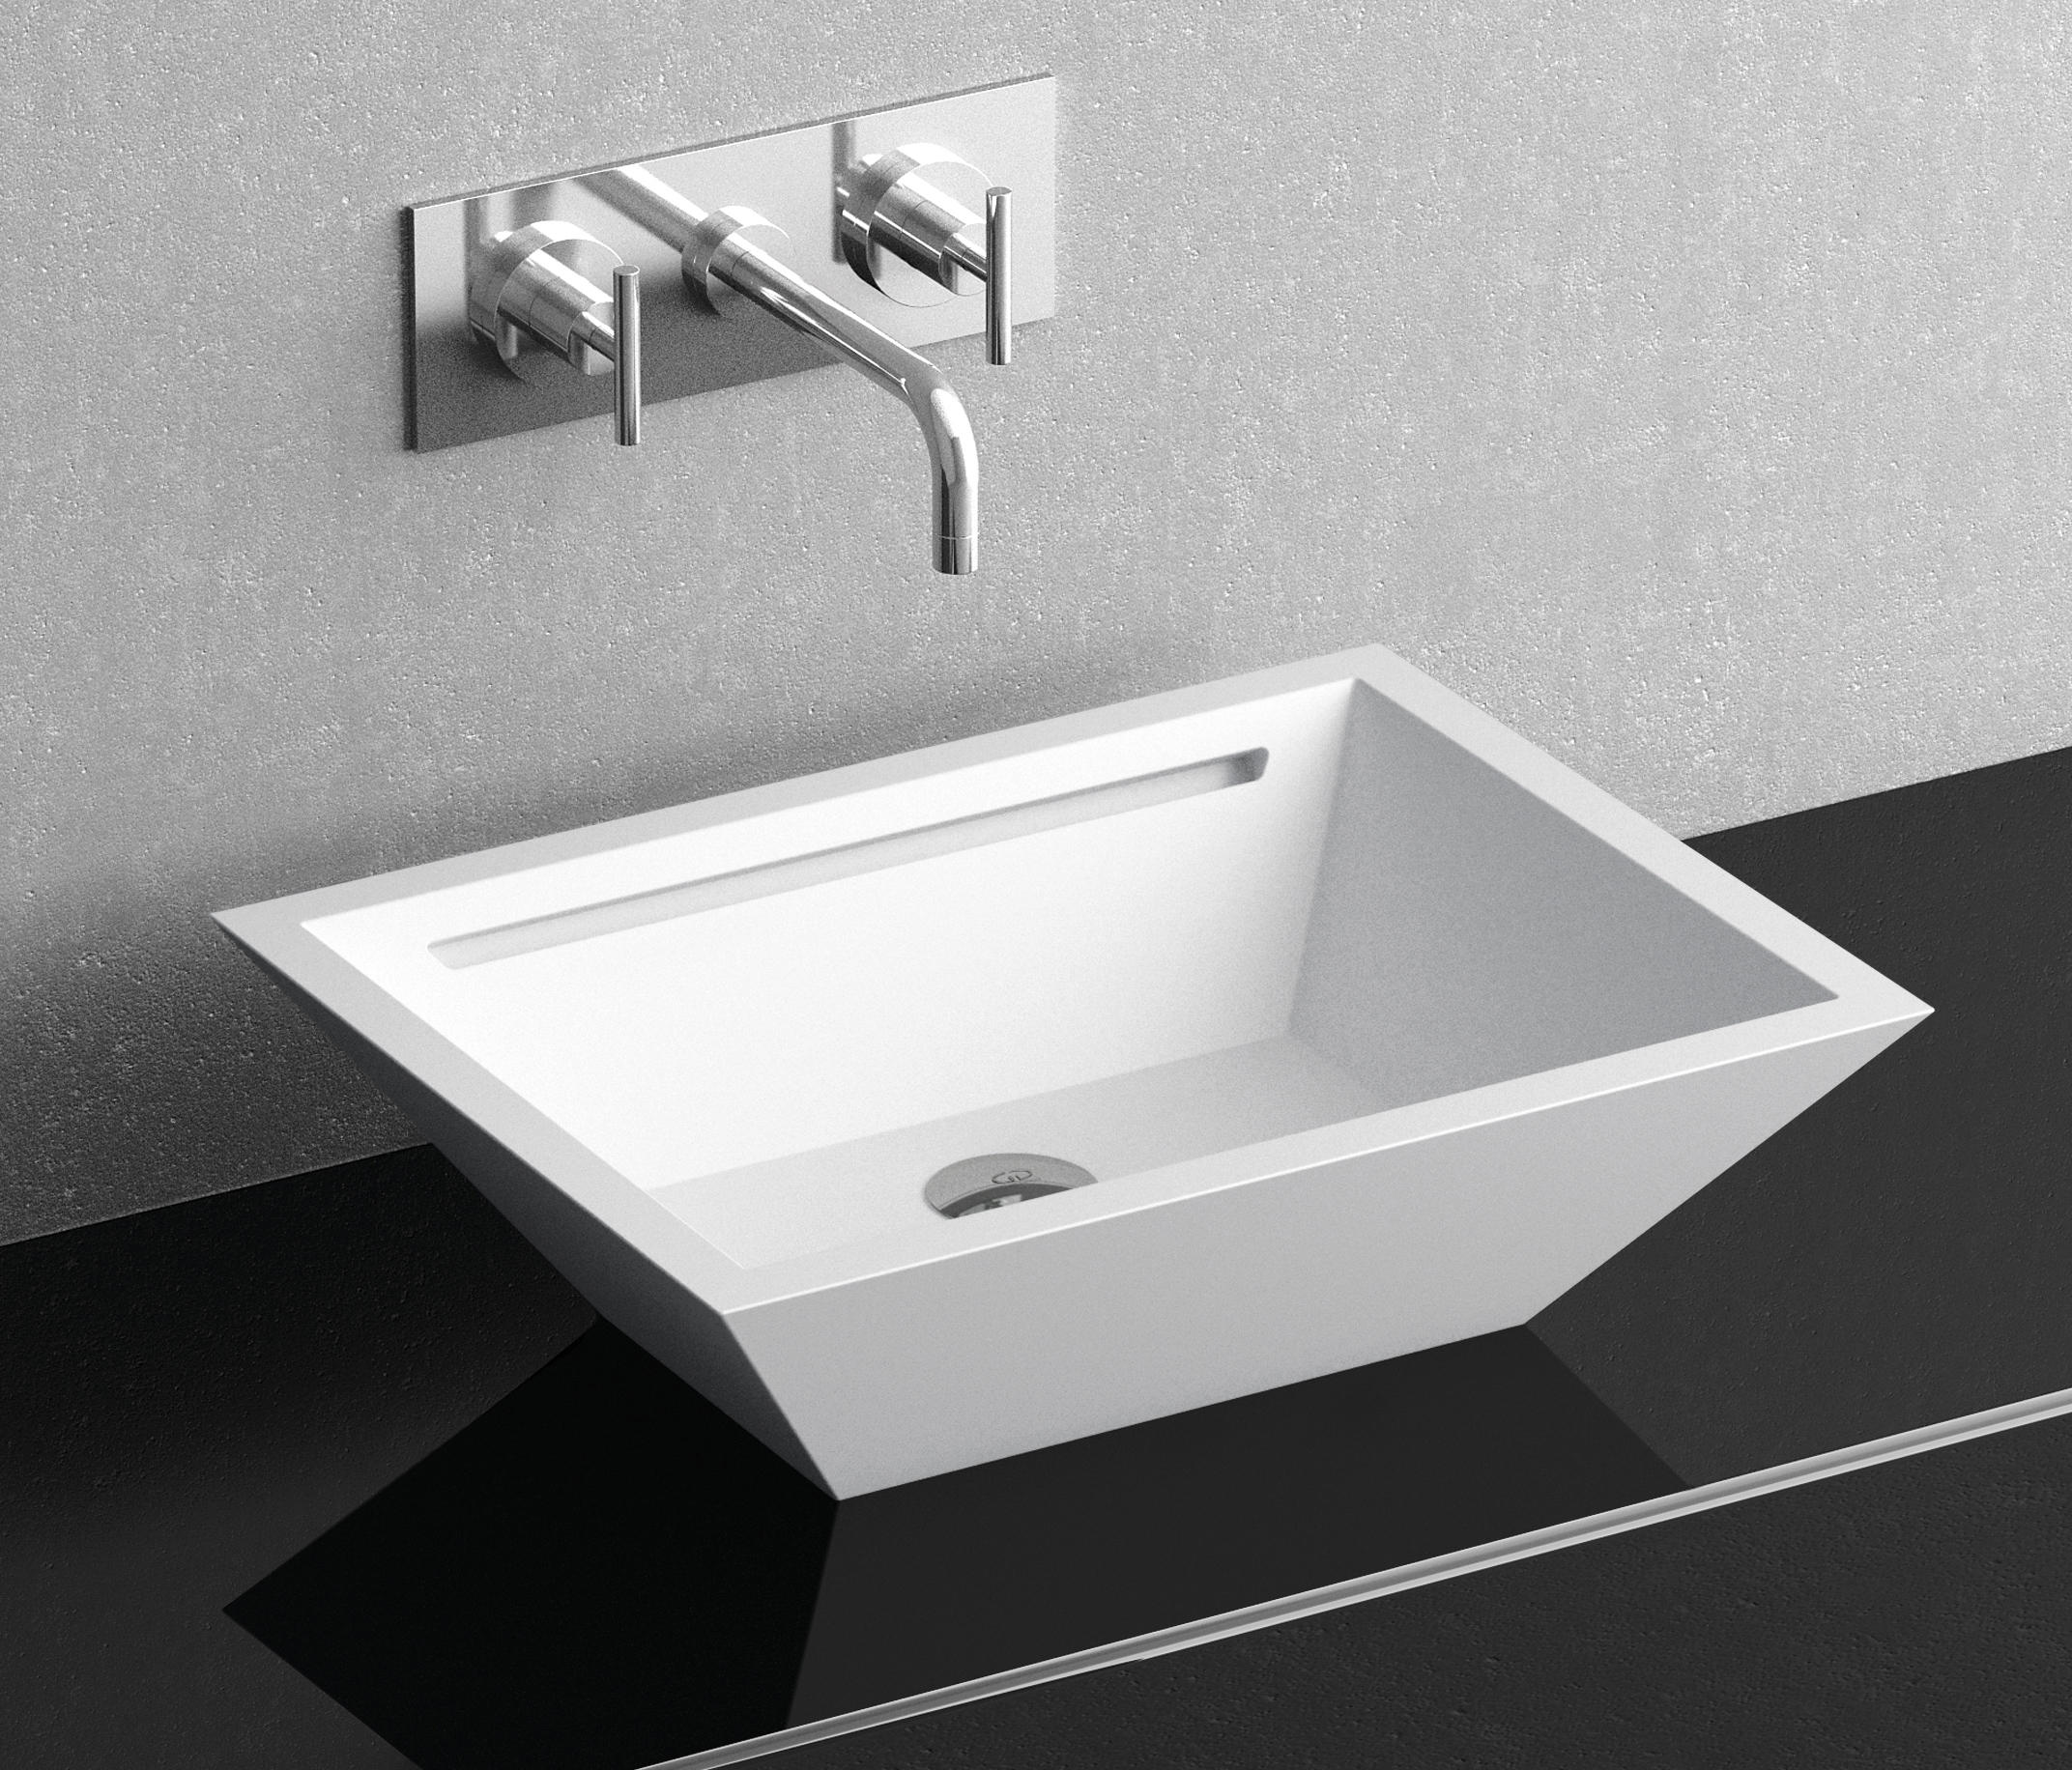 Yacht Wash Basins From Glass Design Architonic